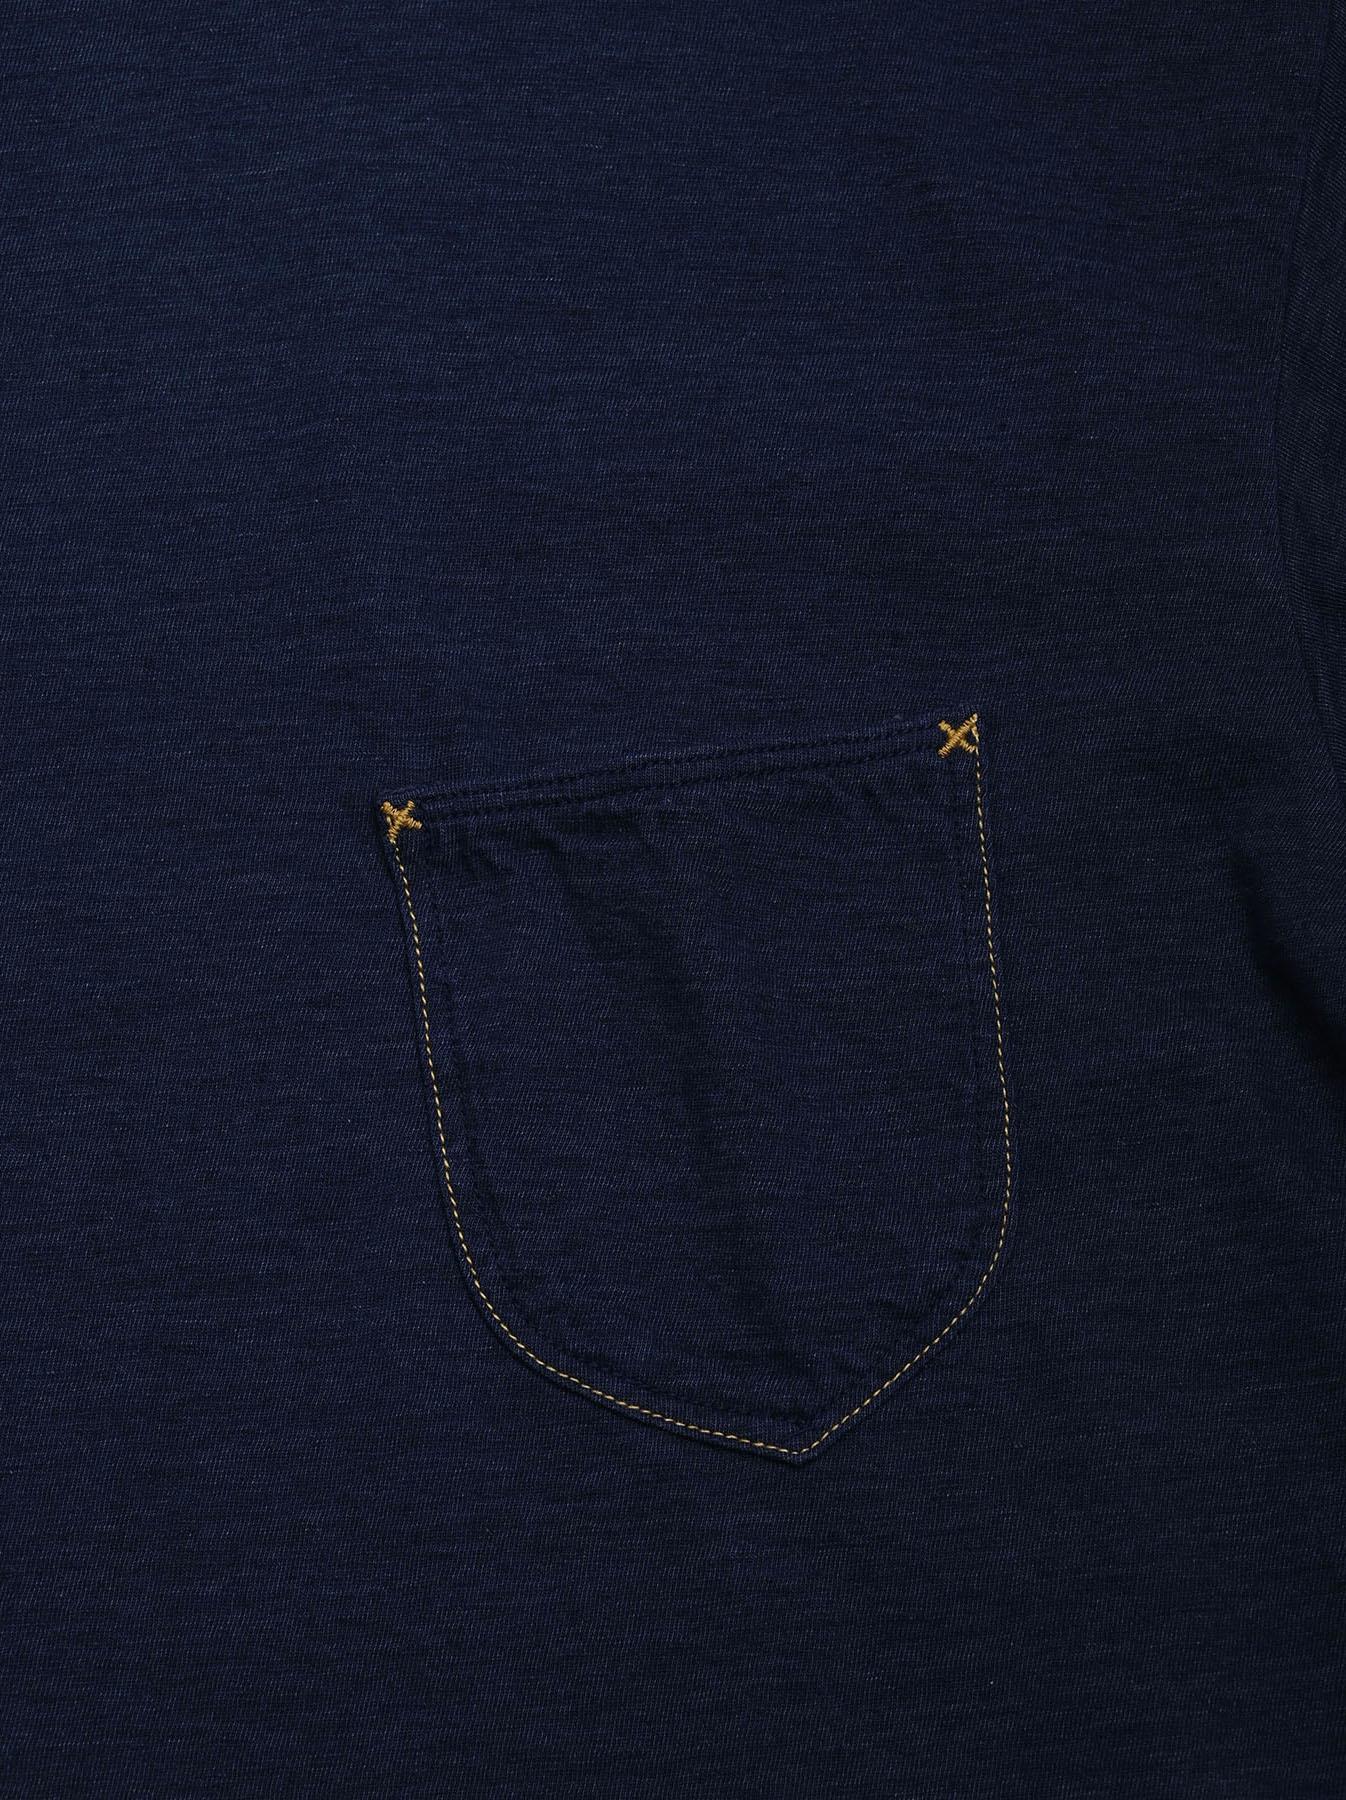 One Wash Indigo Tenjiku 908 Ocean T-Shirt (0621)-12